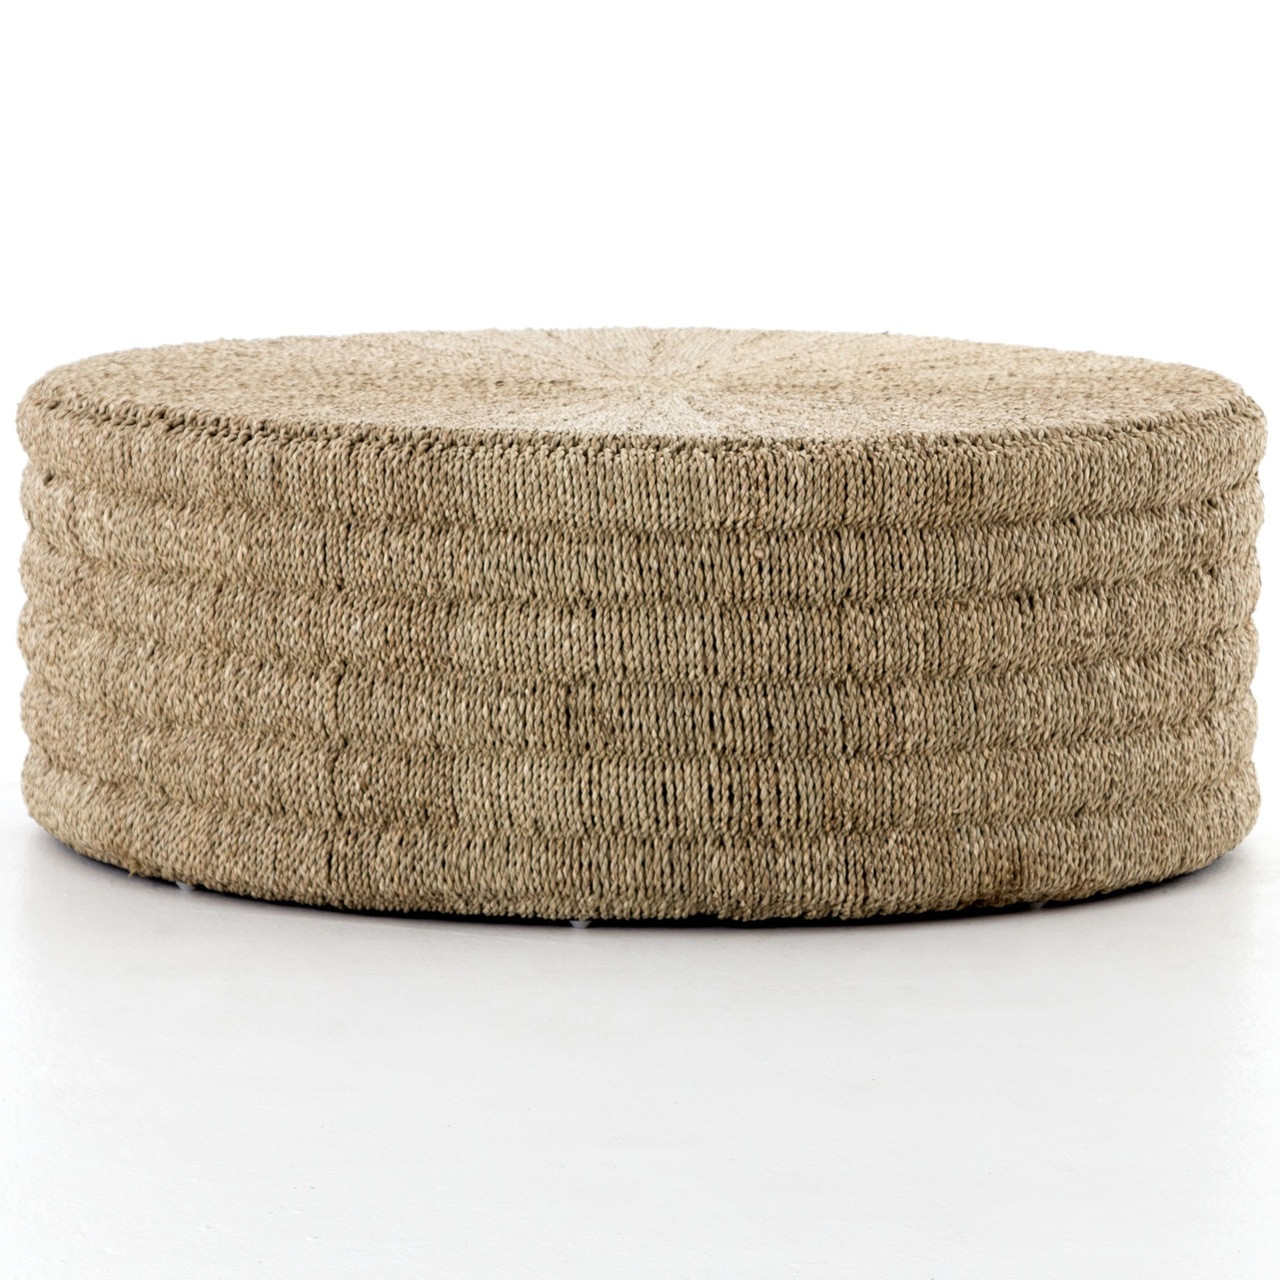 pascal woven round coffee table ottoman